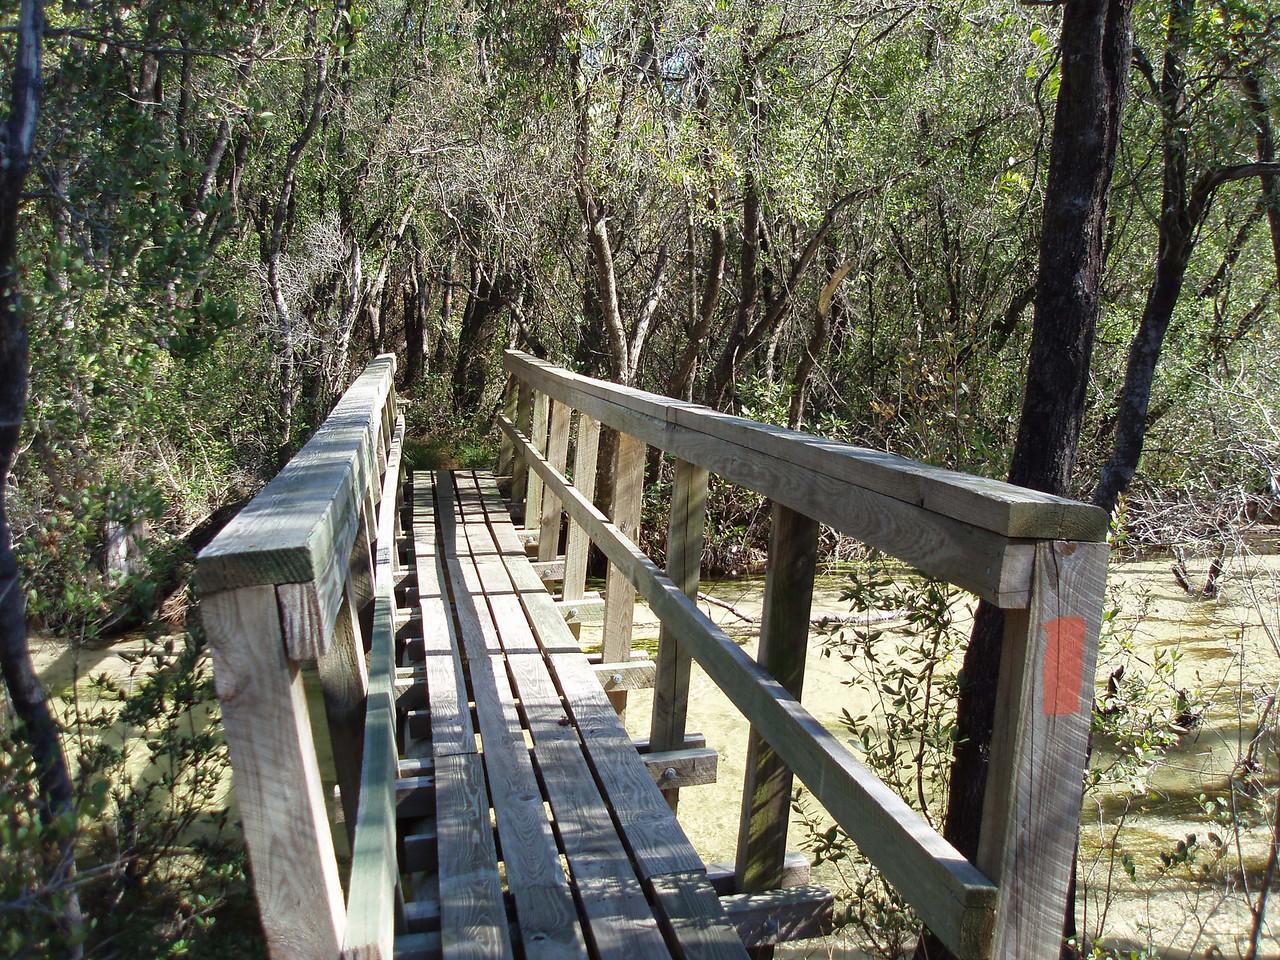 One of Eglin's many bridges<br /> PHOTO CREDIT: Robert Coveney / Florida Trail Association